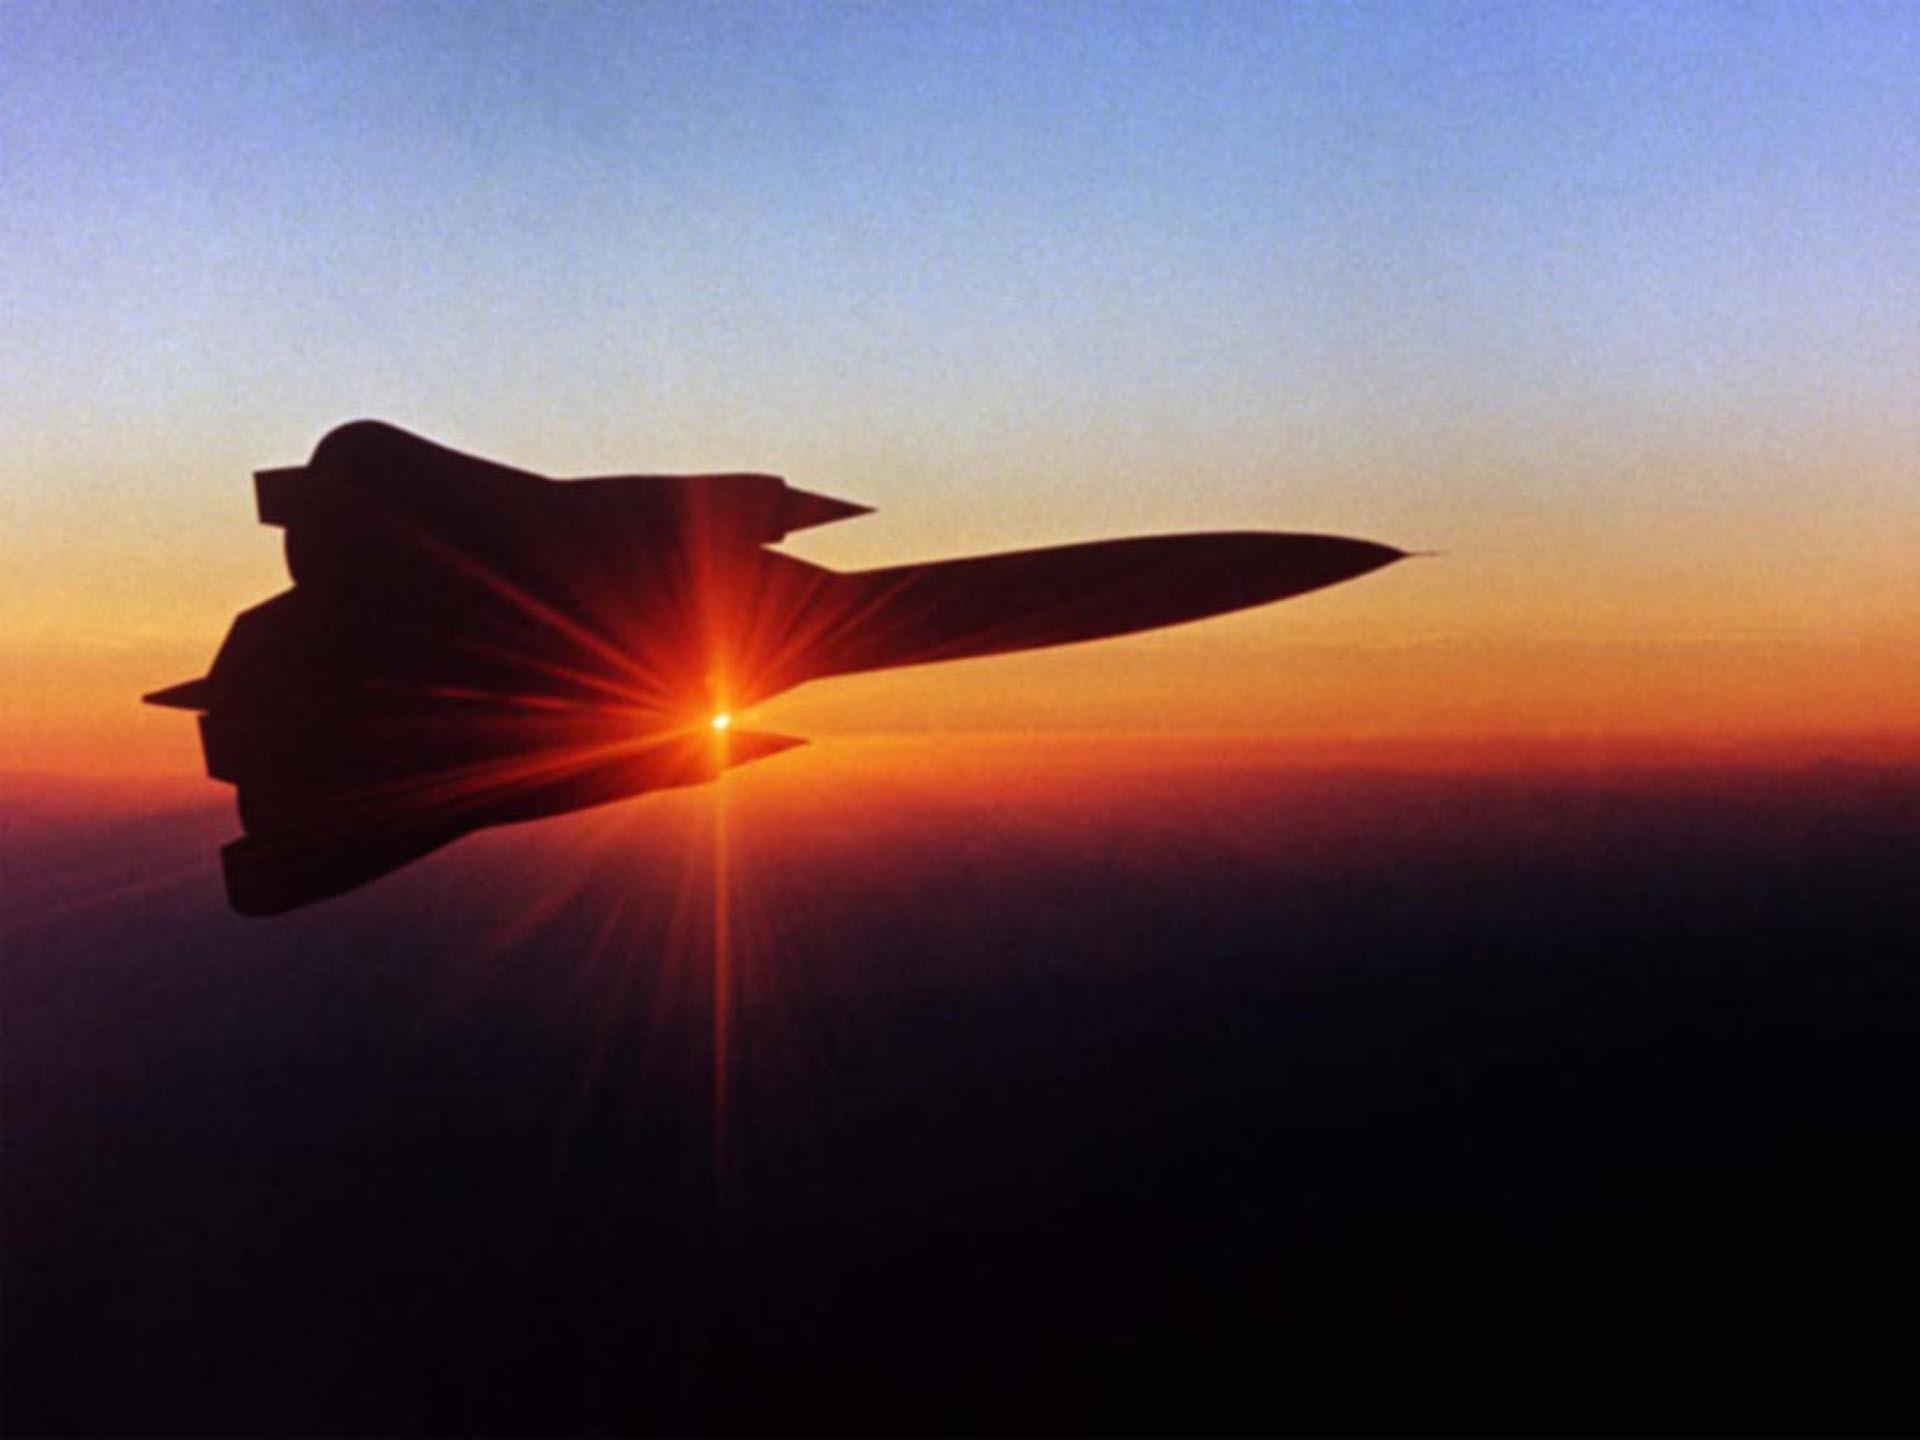 aircrafts-sr-71_00355276.jpg